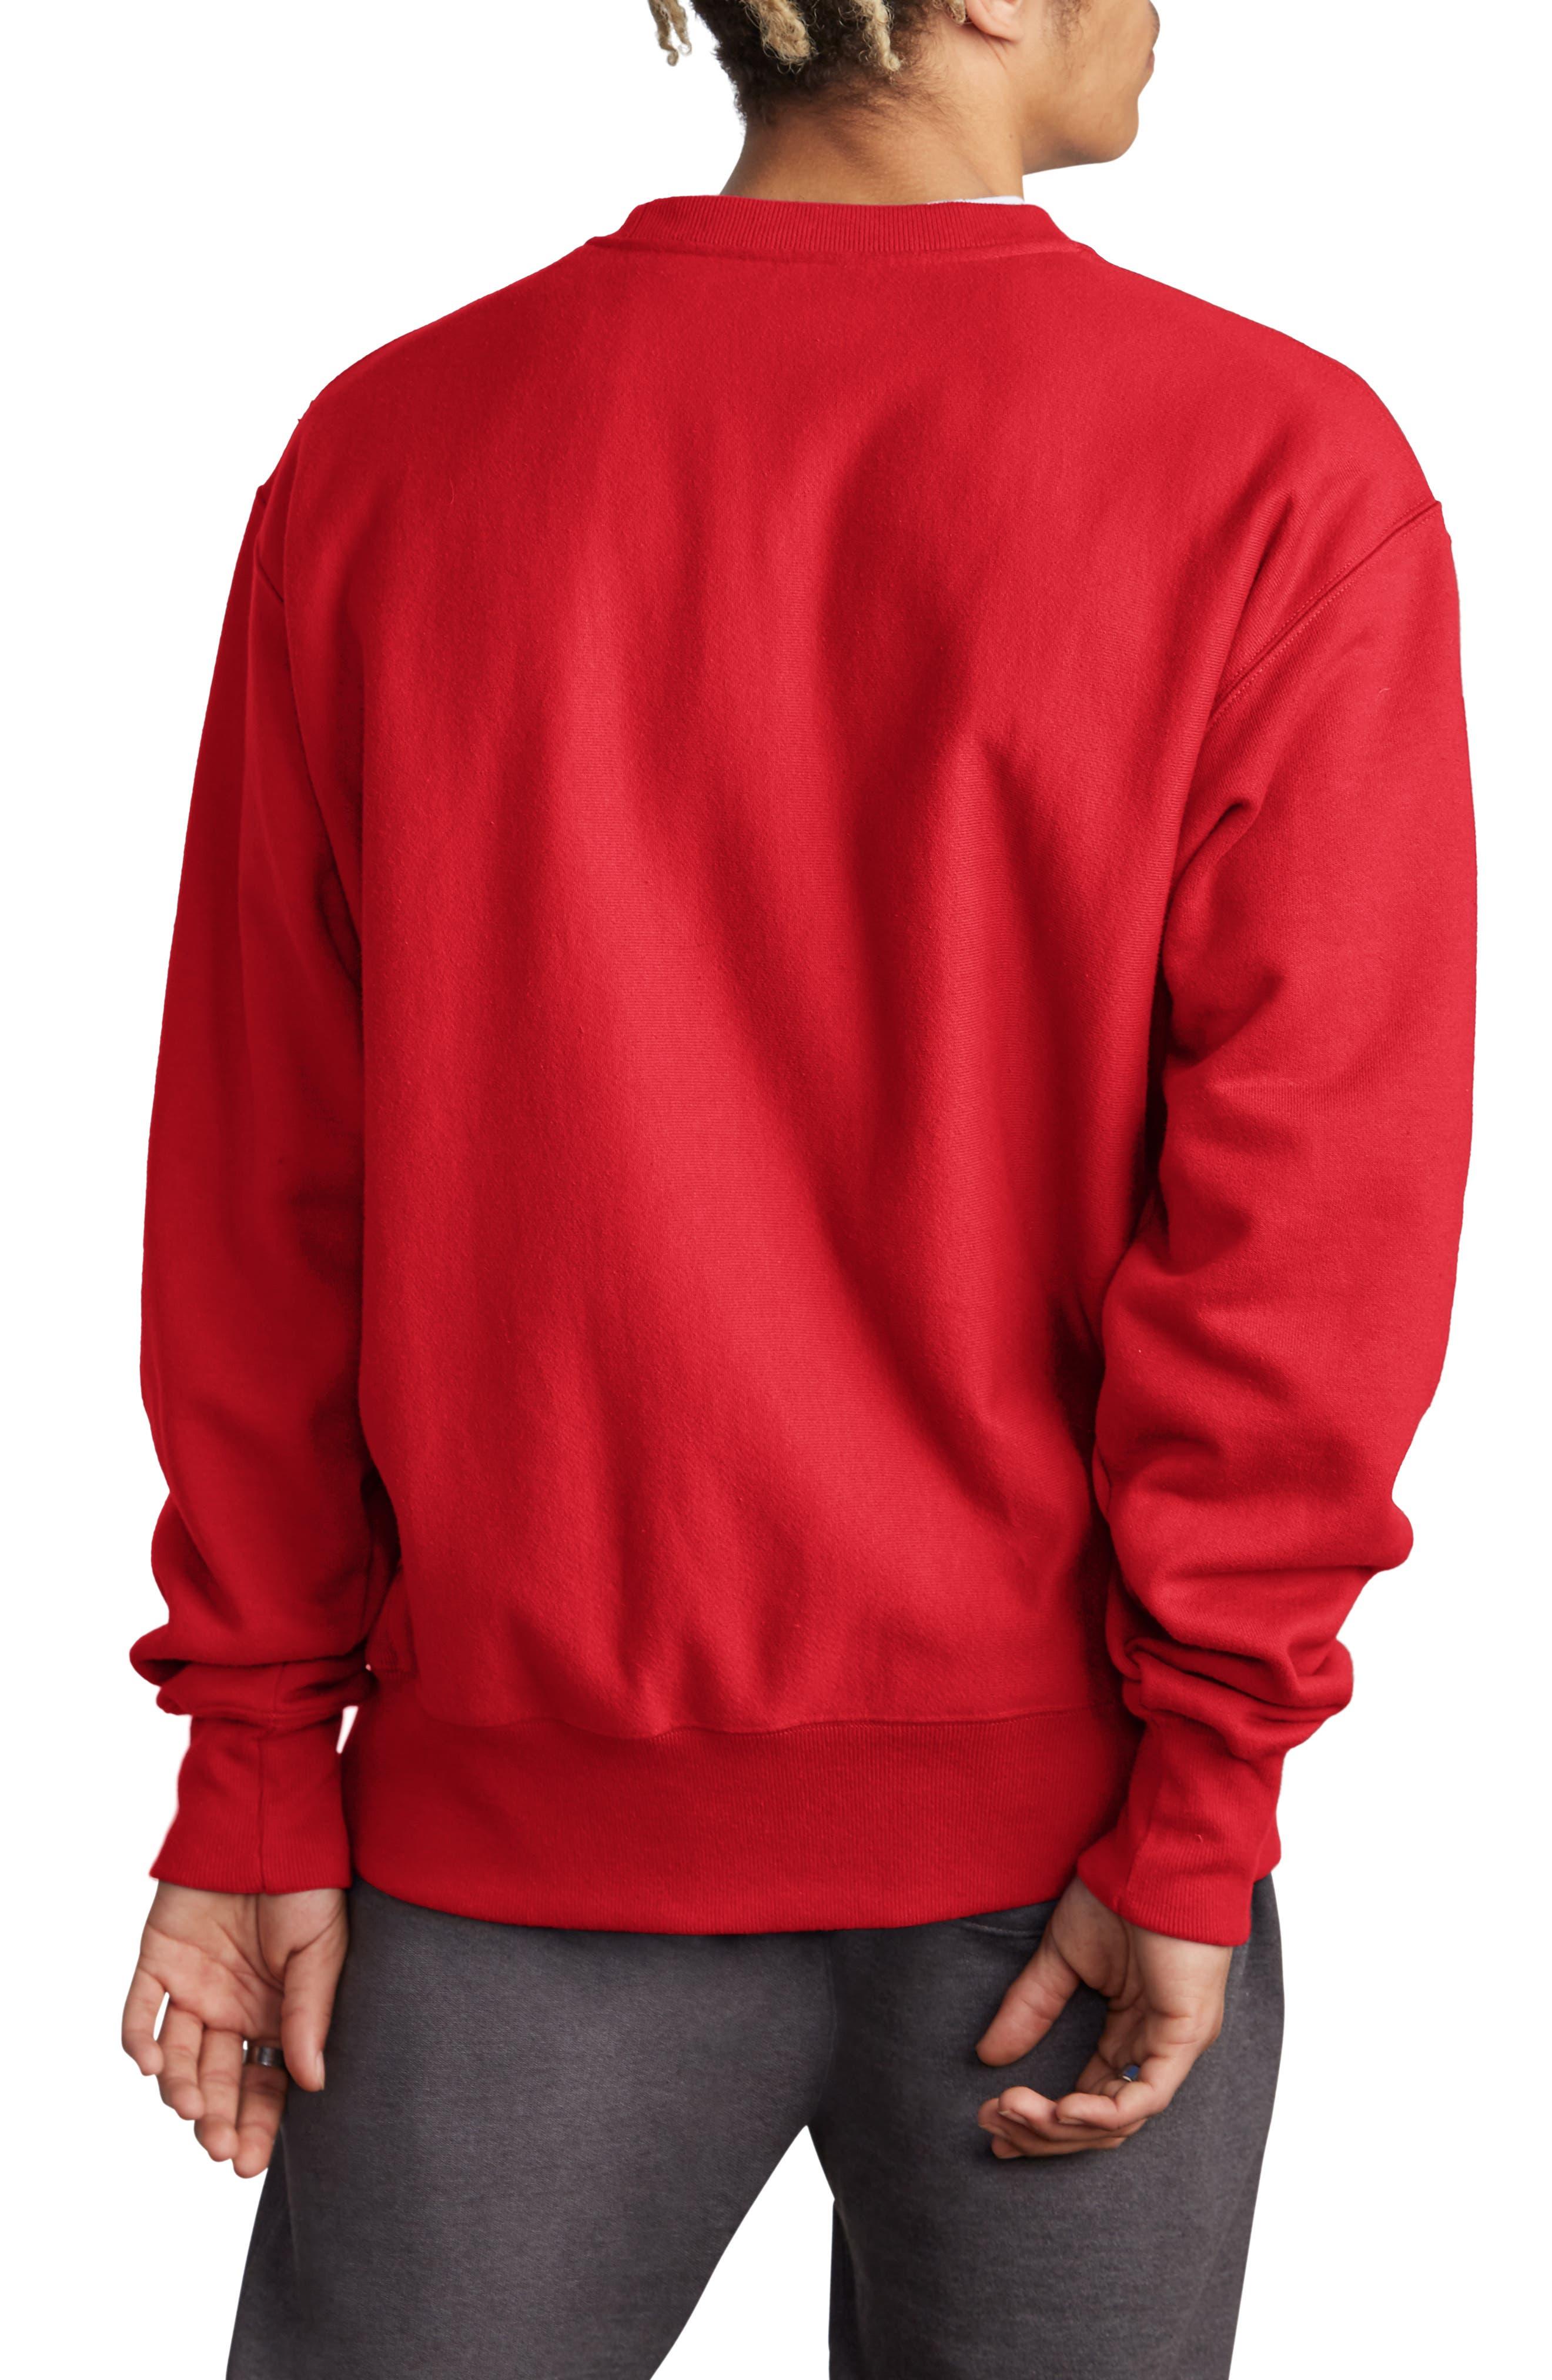 Sublimated Logo Crewneck Sweatshirt,                             Alternate thumbnail 2, color,                             TEAM RED SCARLET